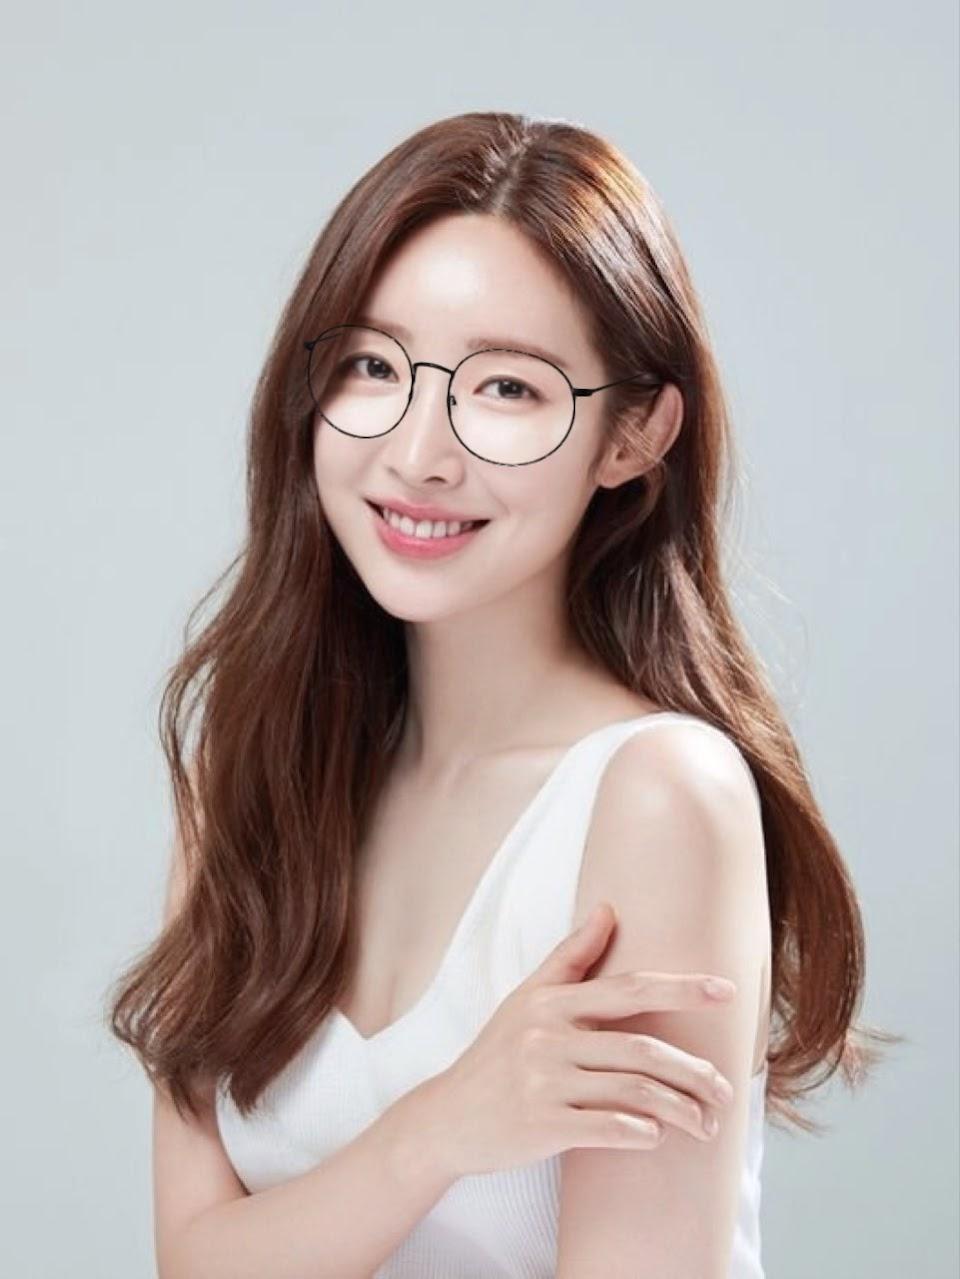 glassesgirls_10